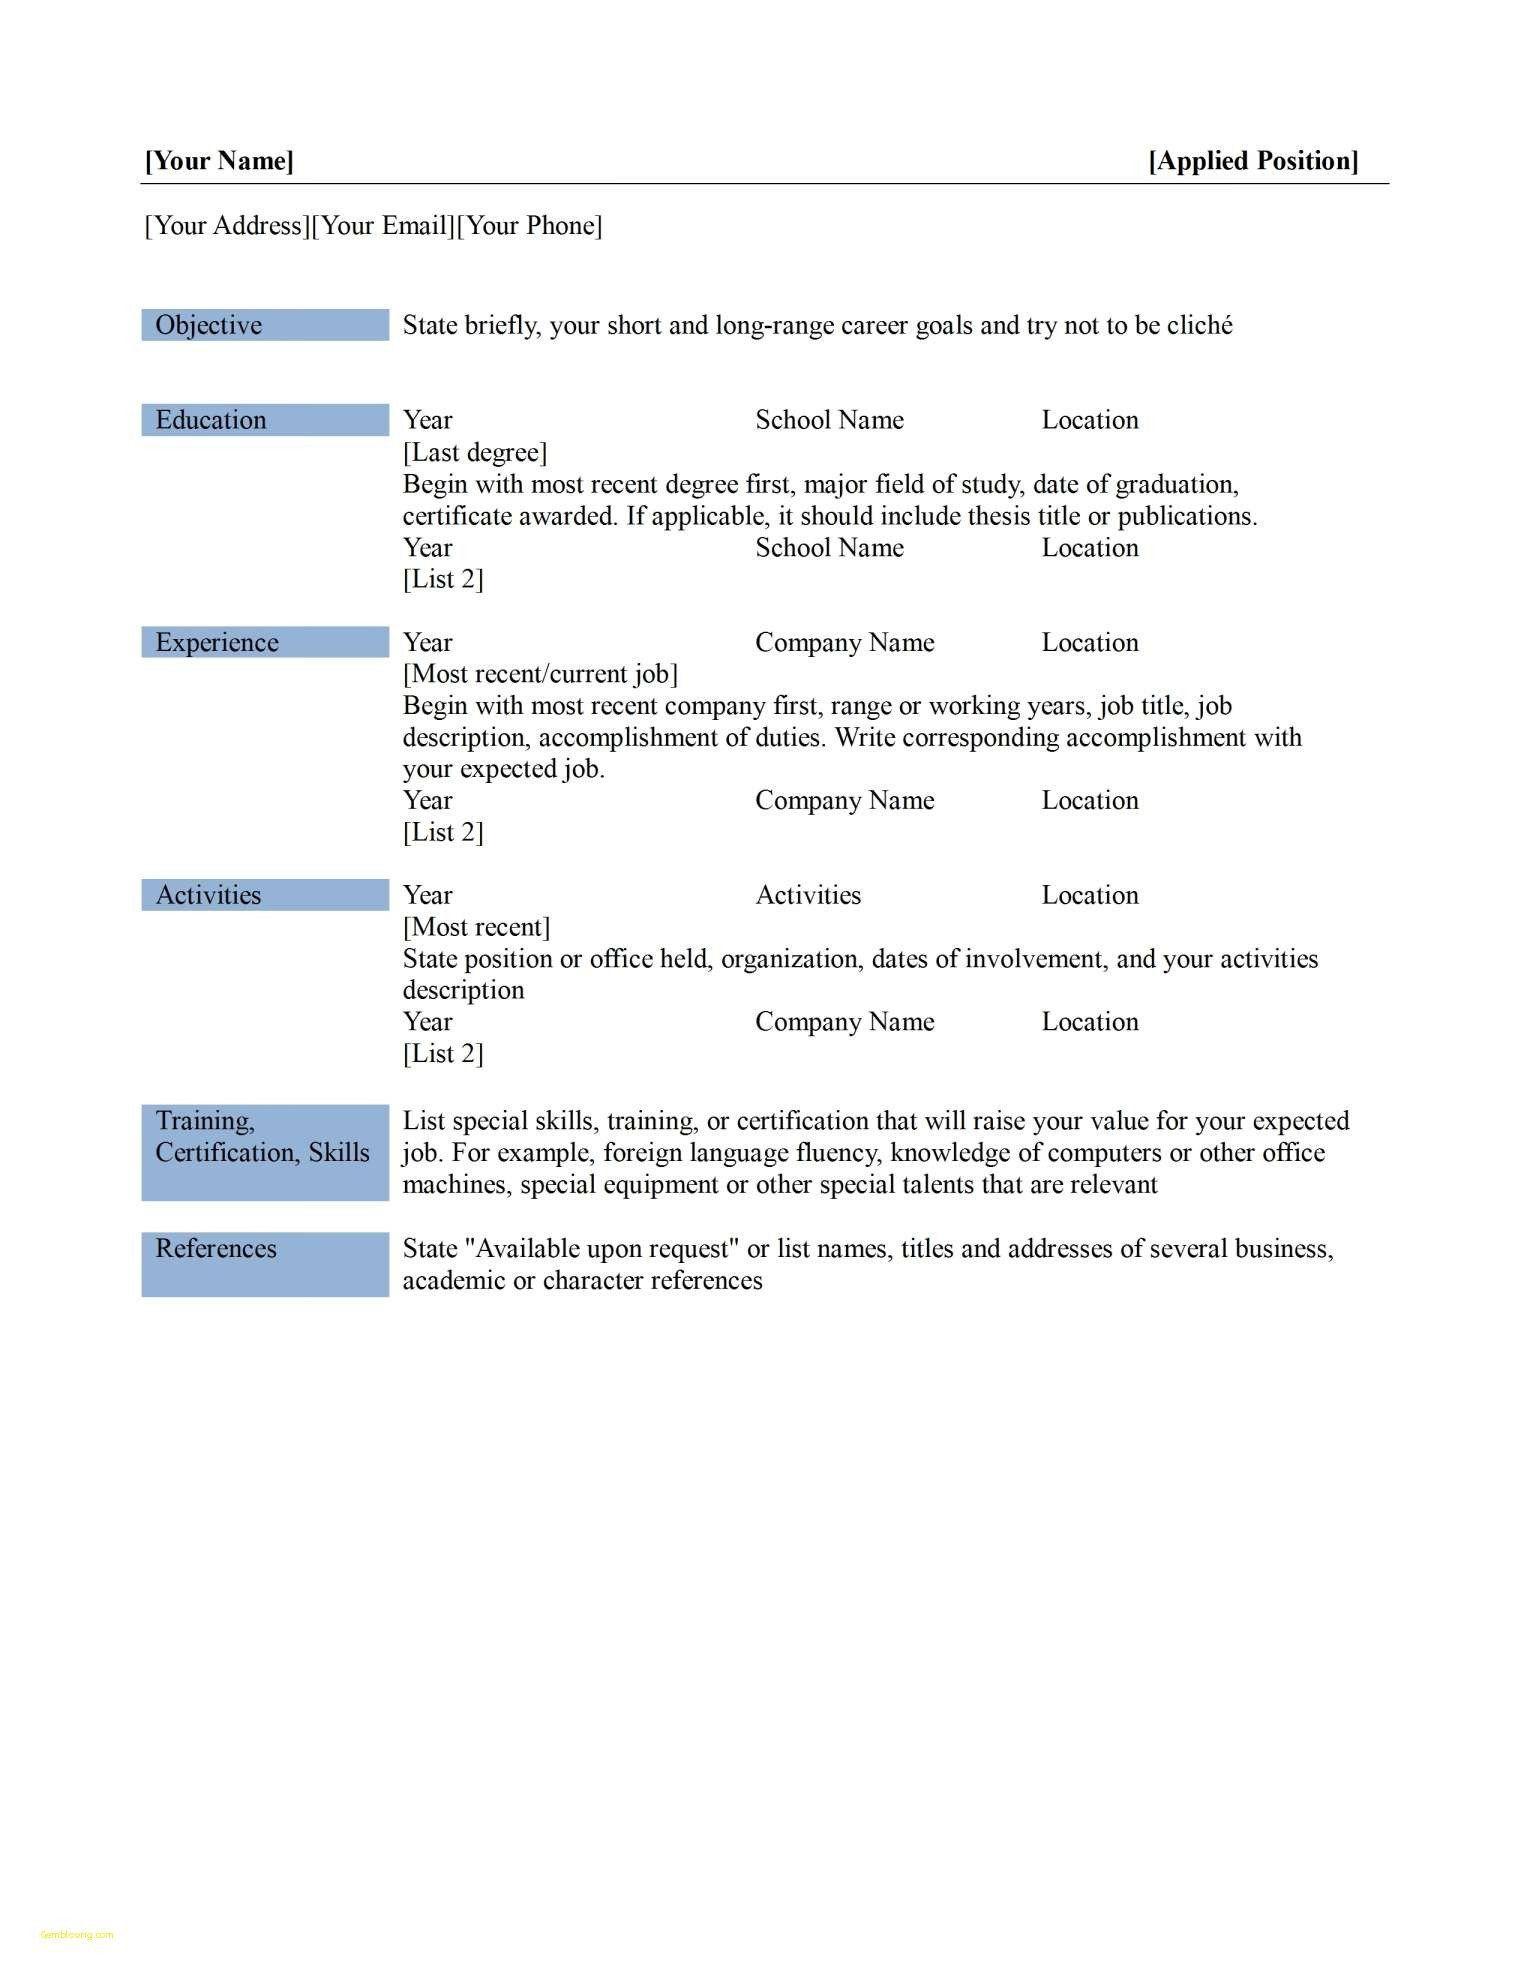 Uga Career Center Resume Best Of Resume Builder Uga Hudsonhs Resume Template Free Functional Resume Template Basic Resume